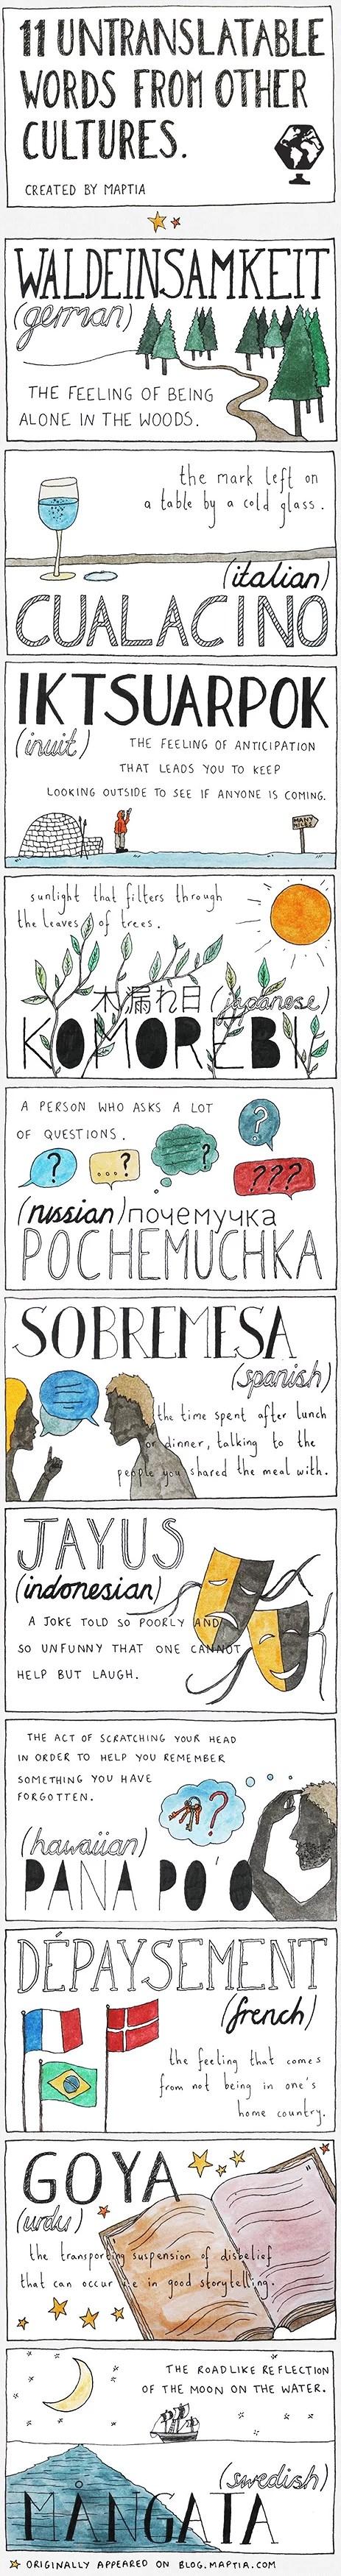 11 untranslatable words